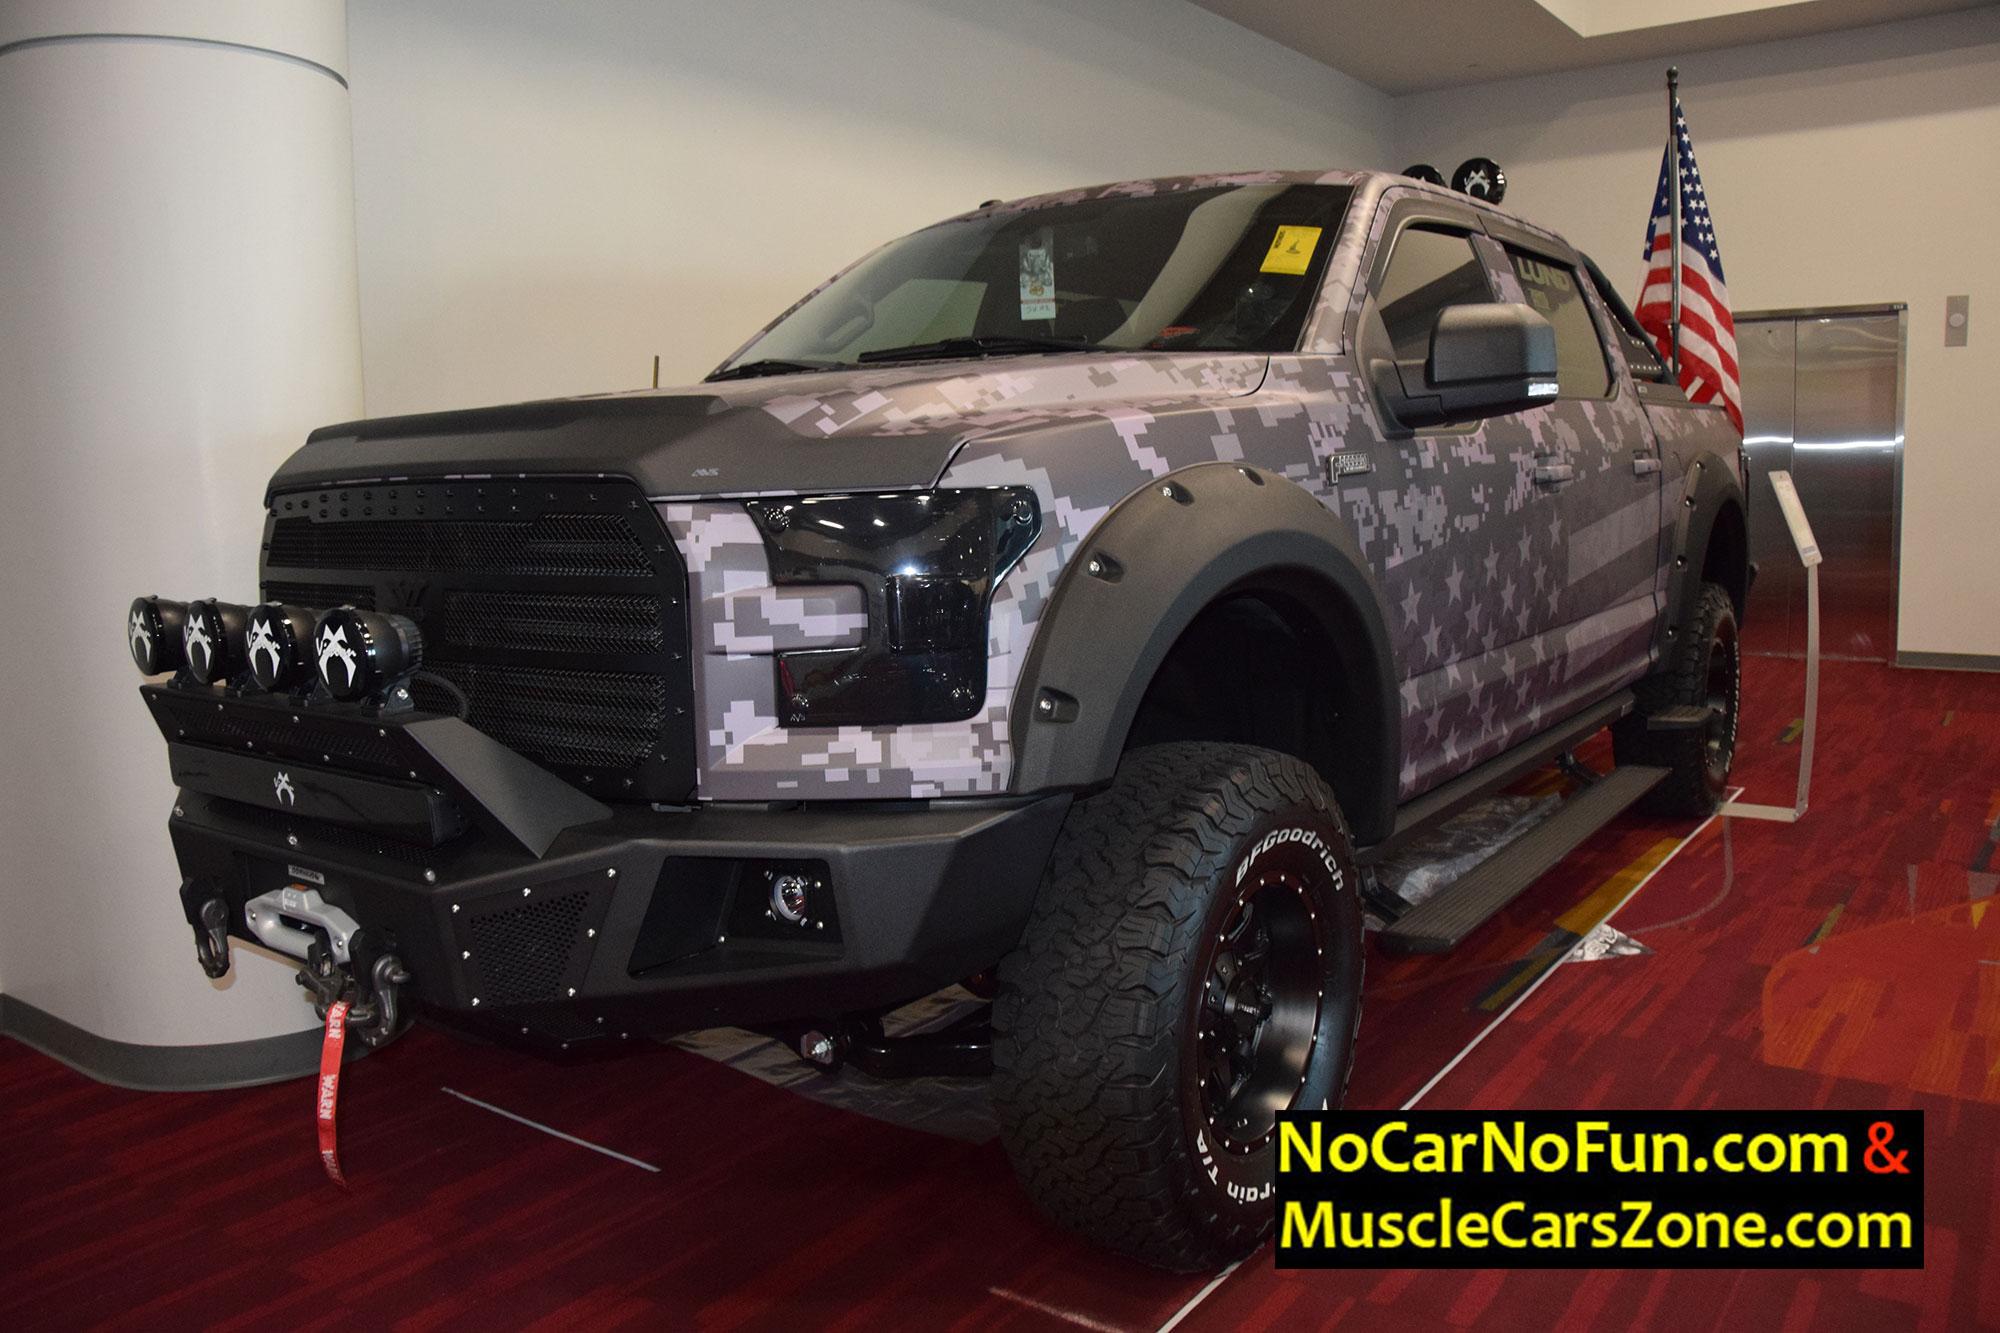 Wallpaper American Muscle Car Musclecarszone Official Judge 2016 Sema Show Las Vegas